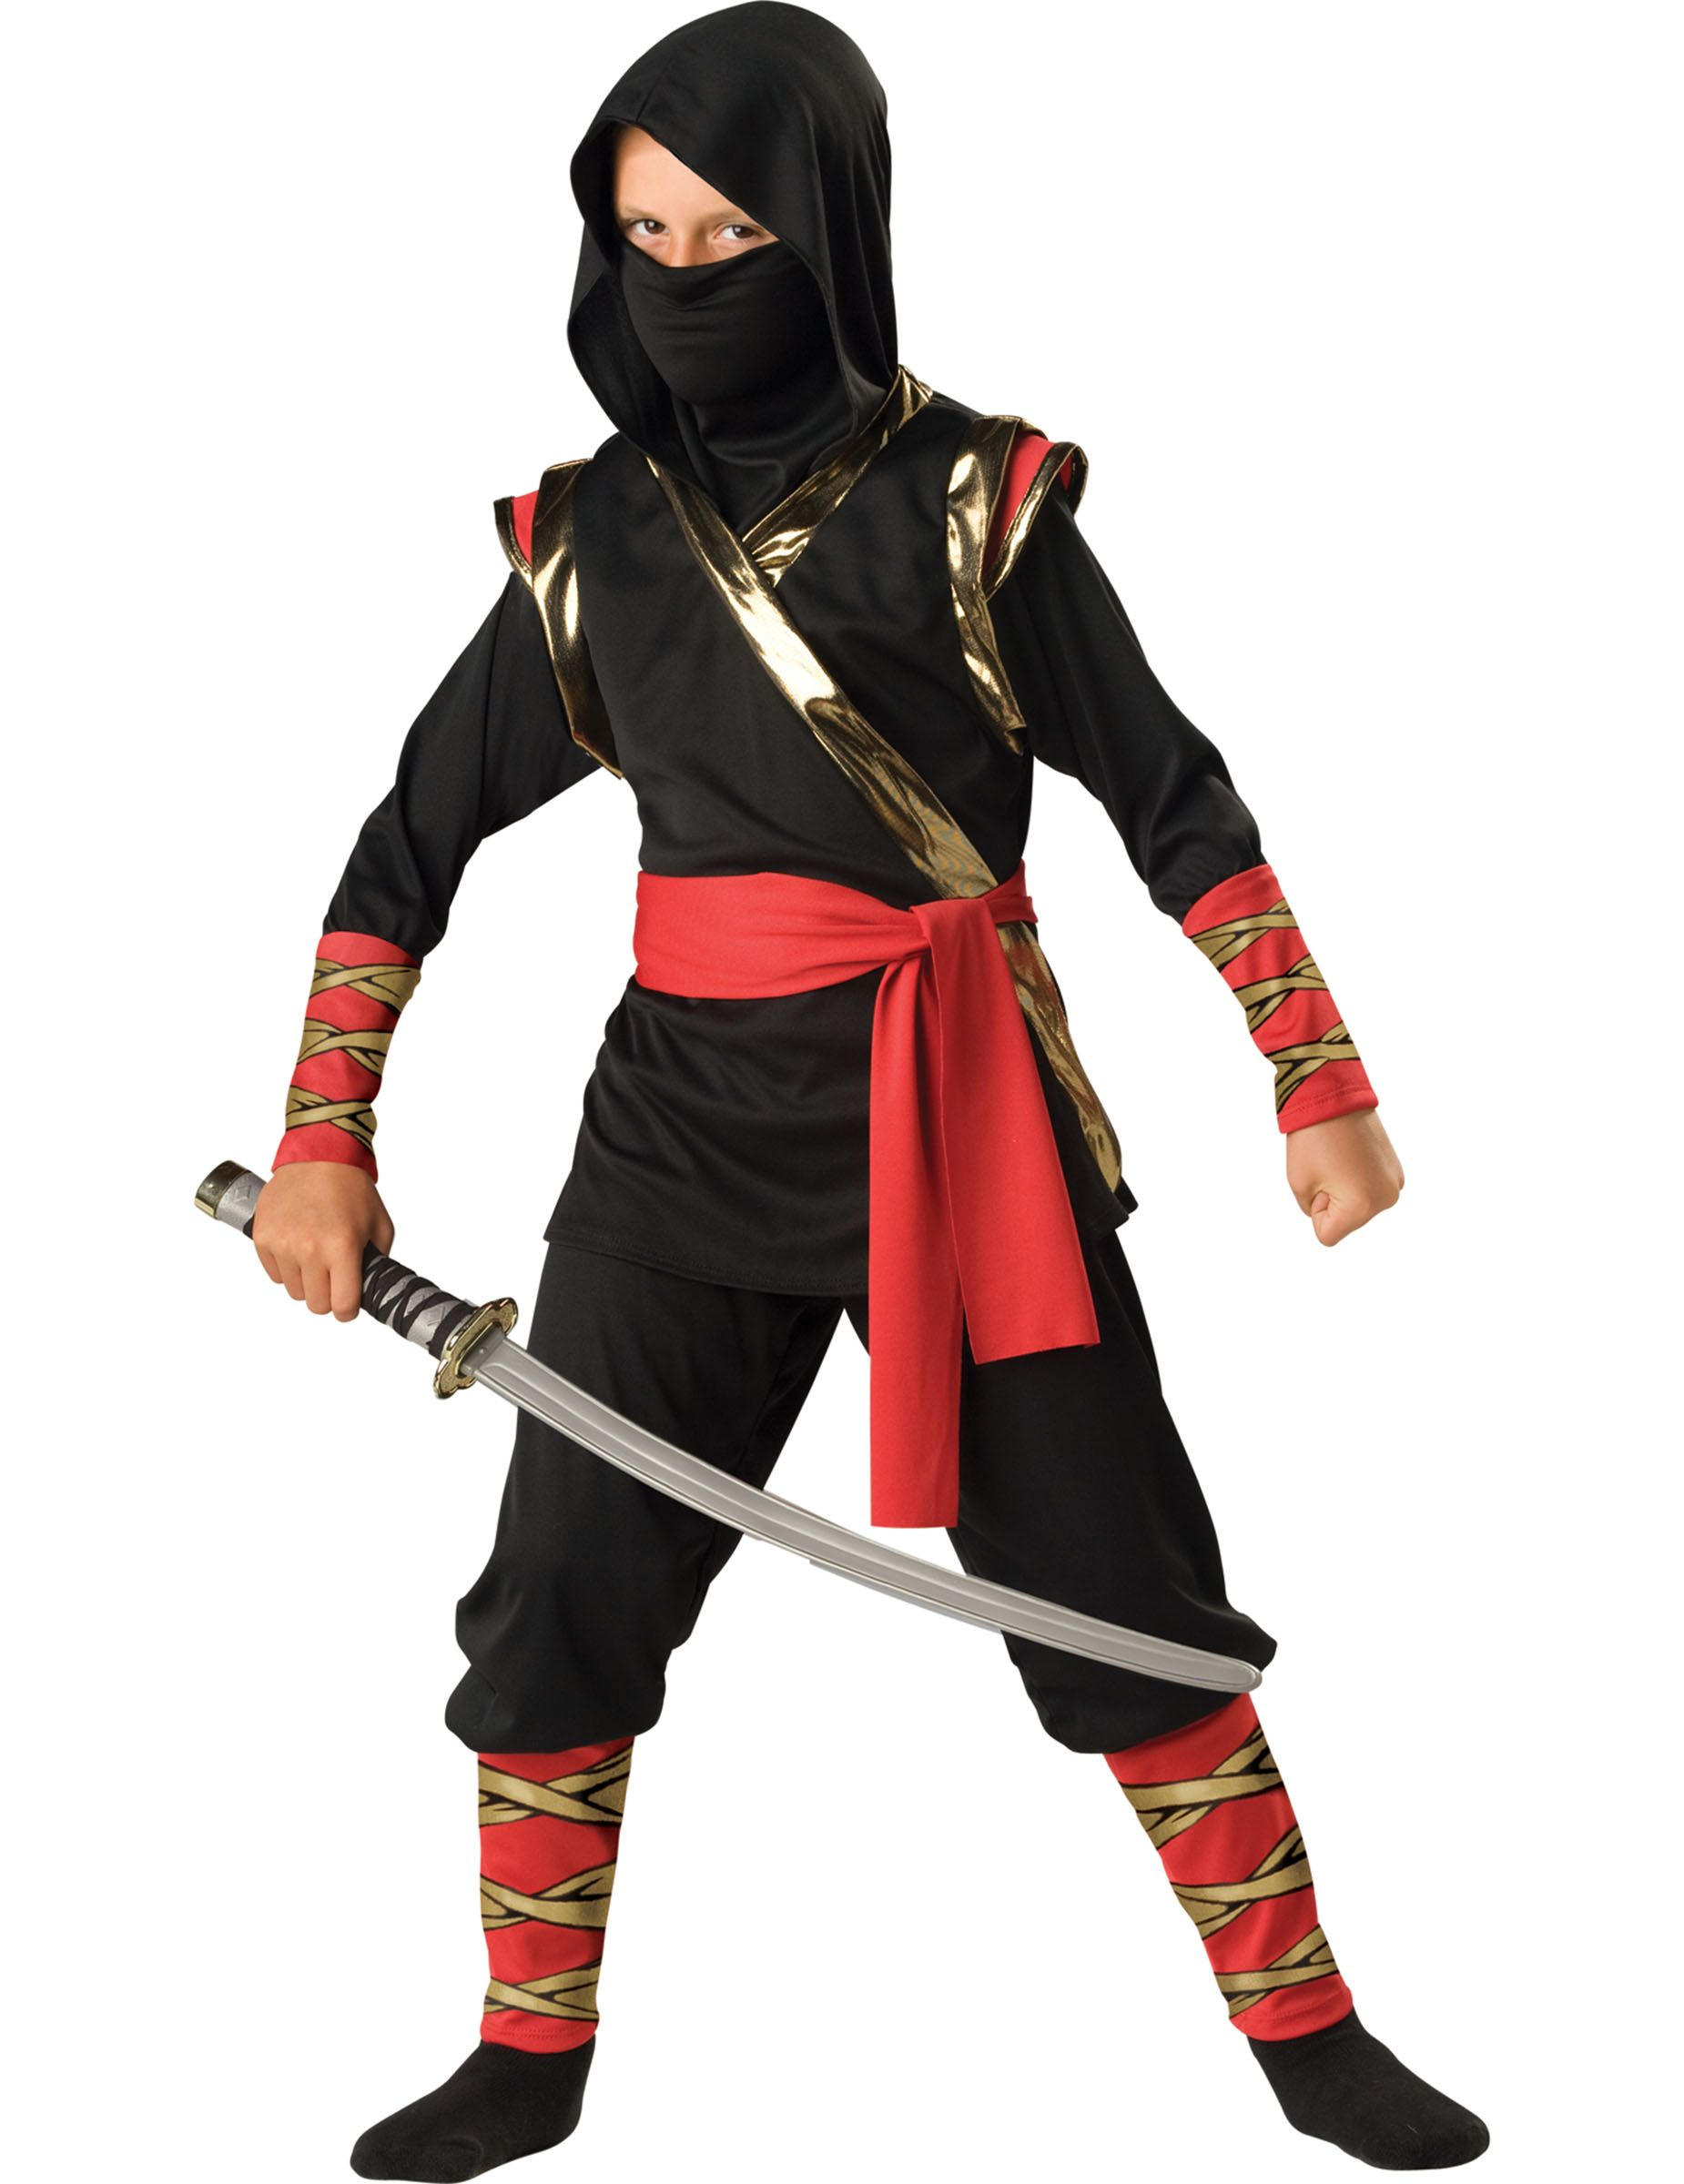 4ce639197 Disfraz Ninja para niño -Premium  Este disfraz de Ninja para niño incluye  camiseta